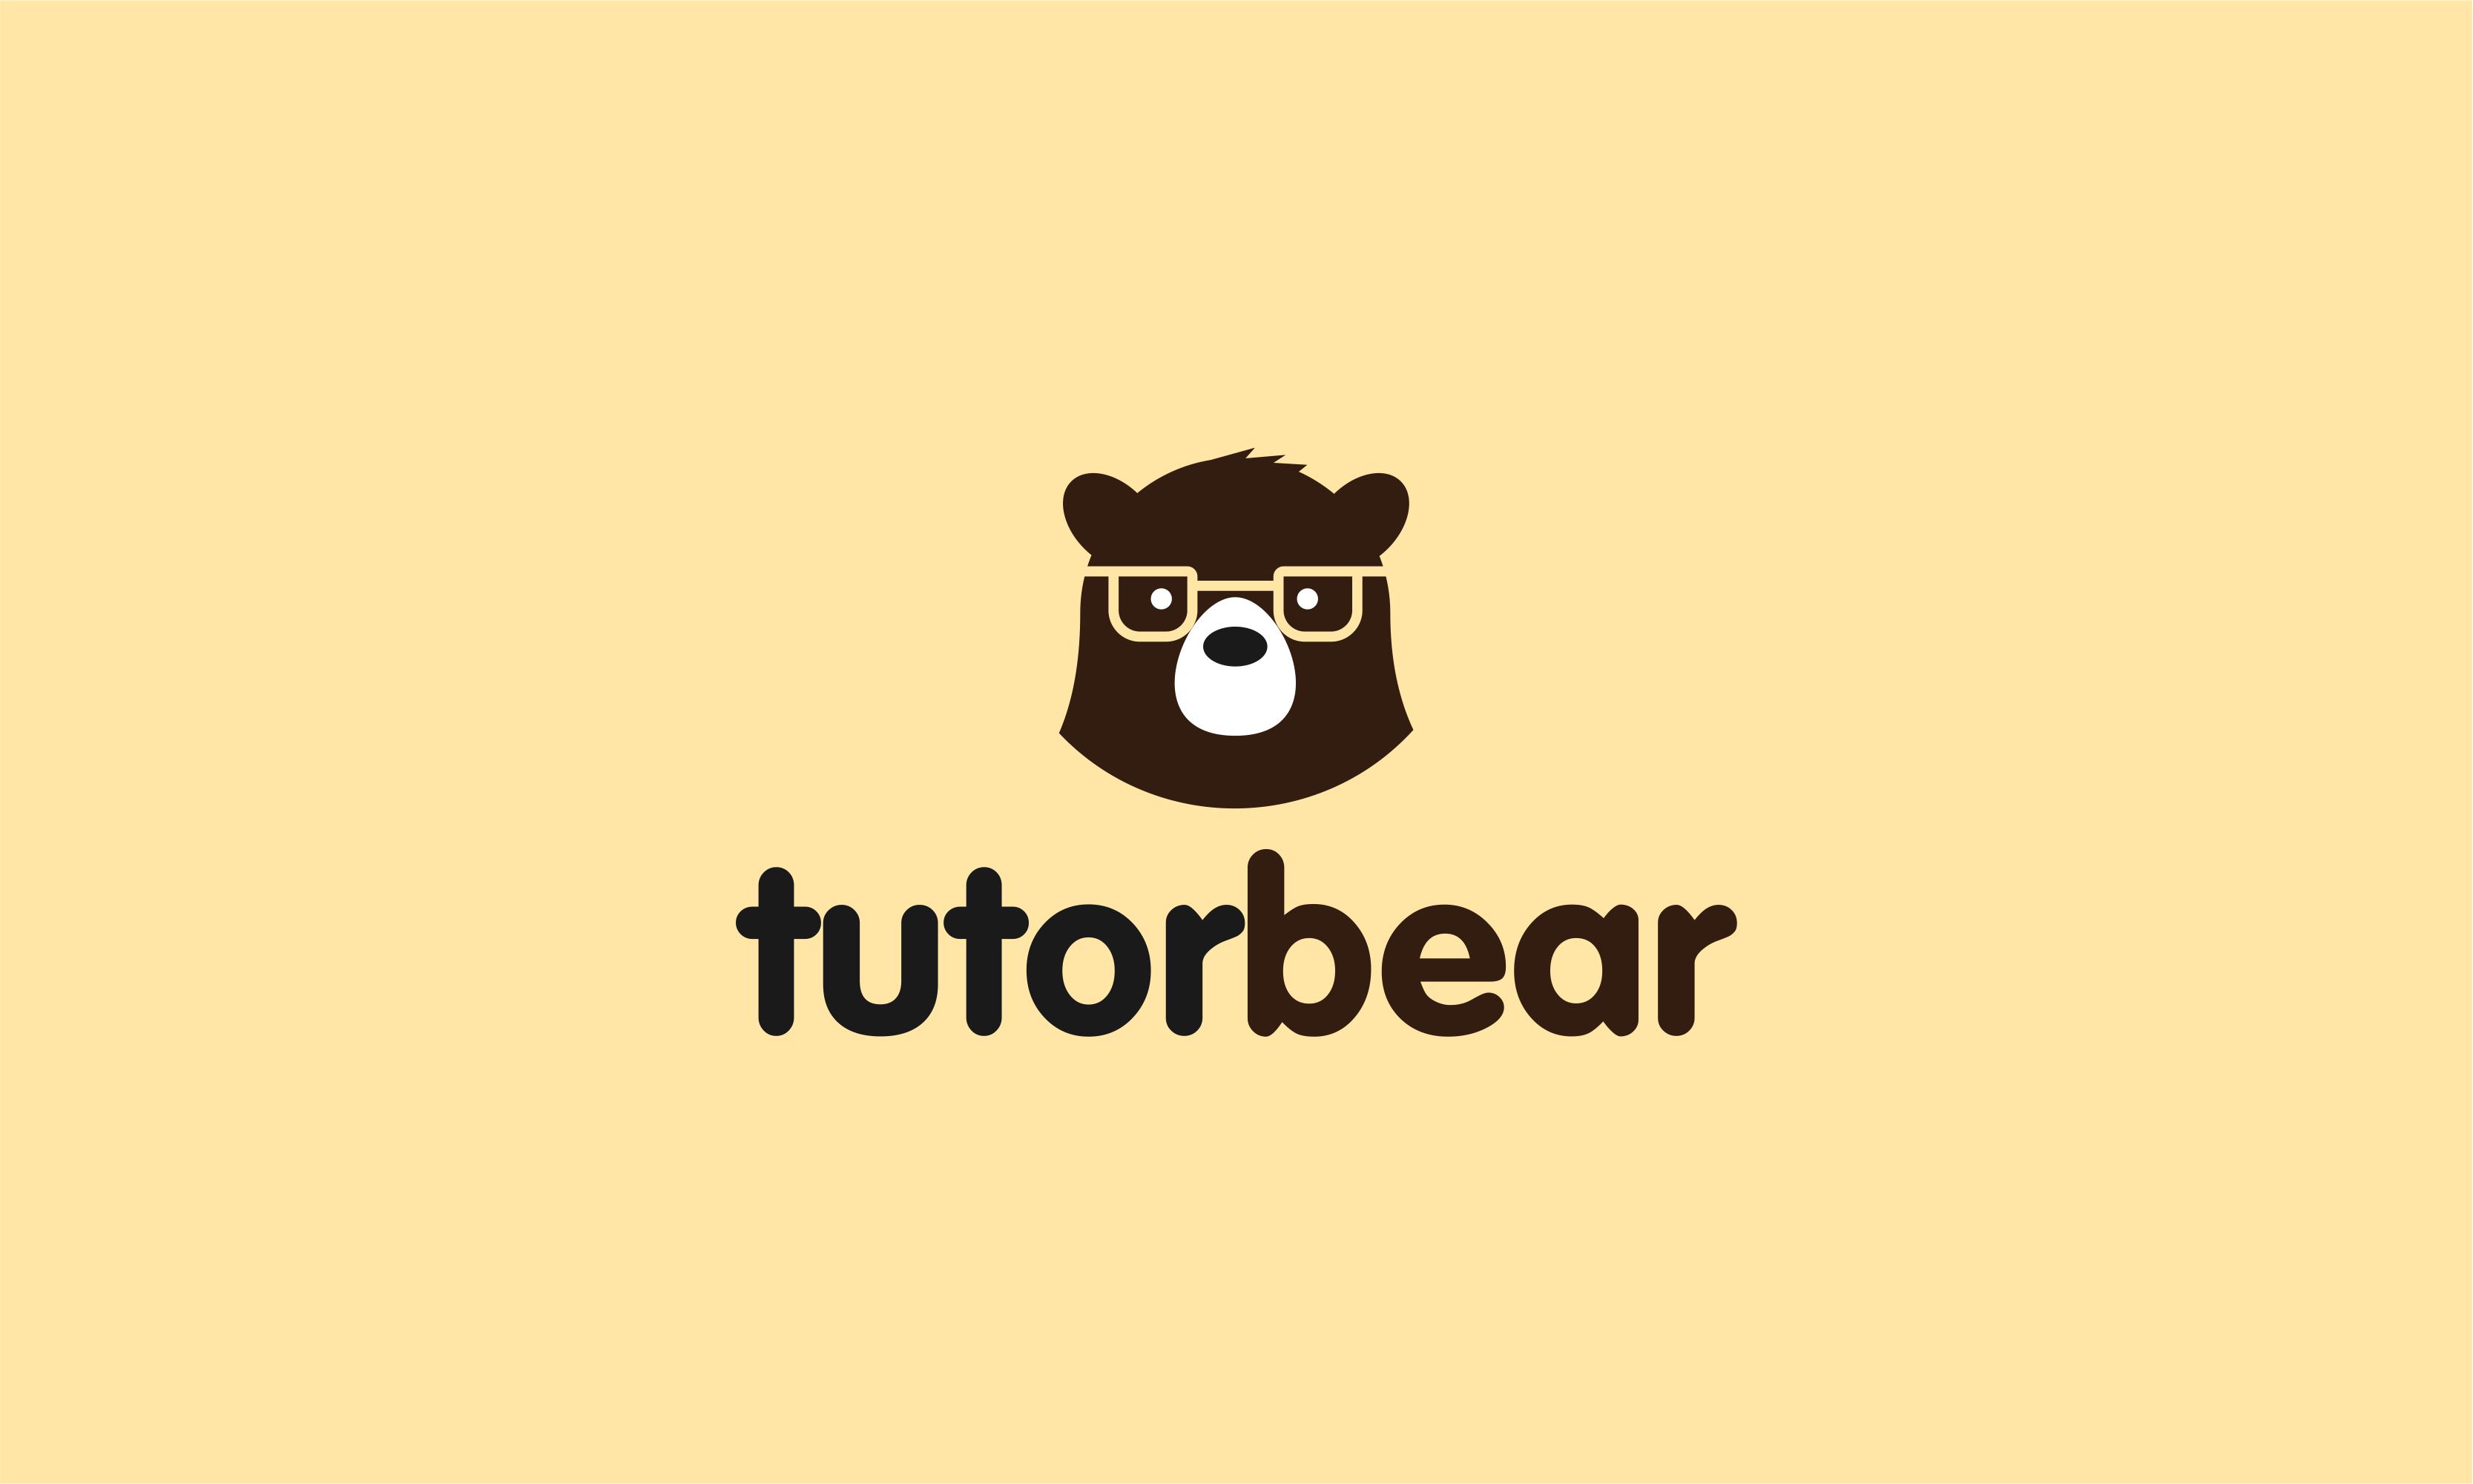 Tutorbear